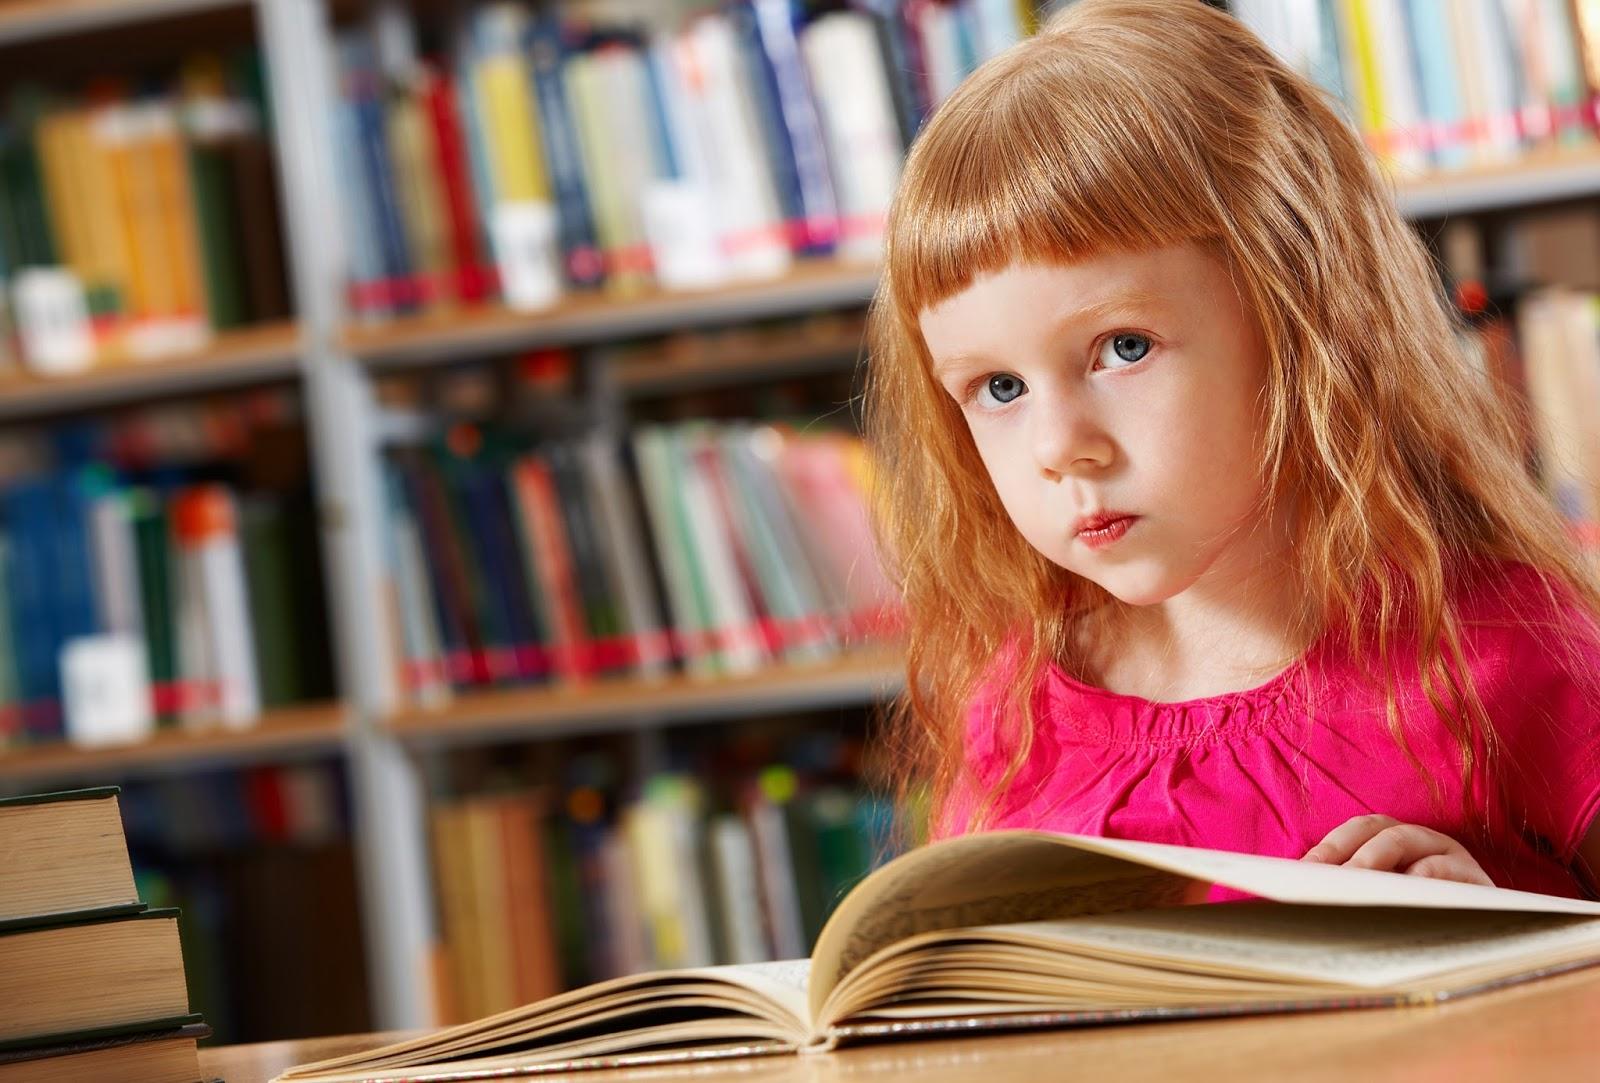 namc montessori circle of inclusion classic presentation. girl reading a book